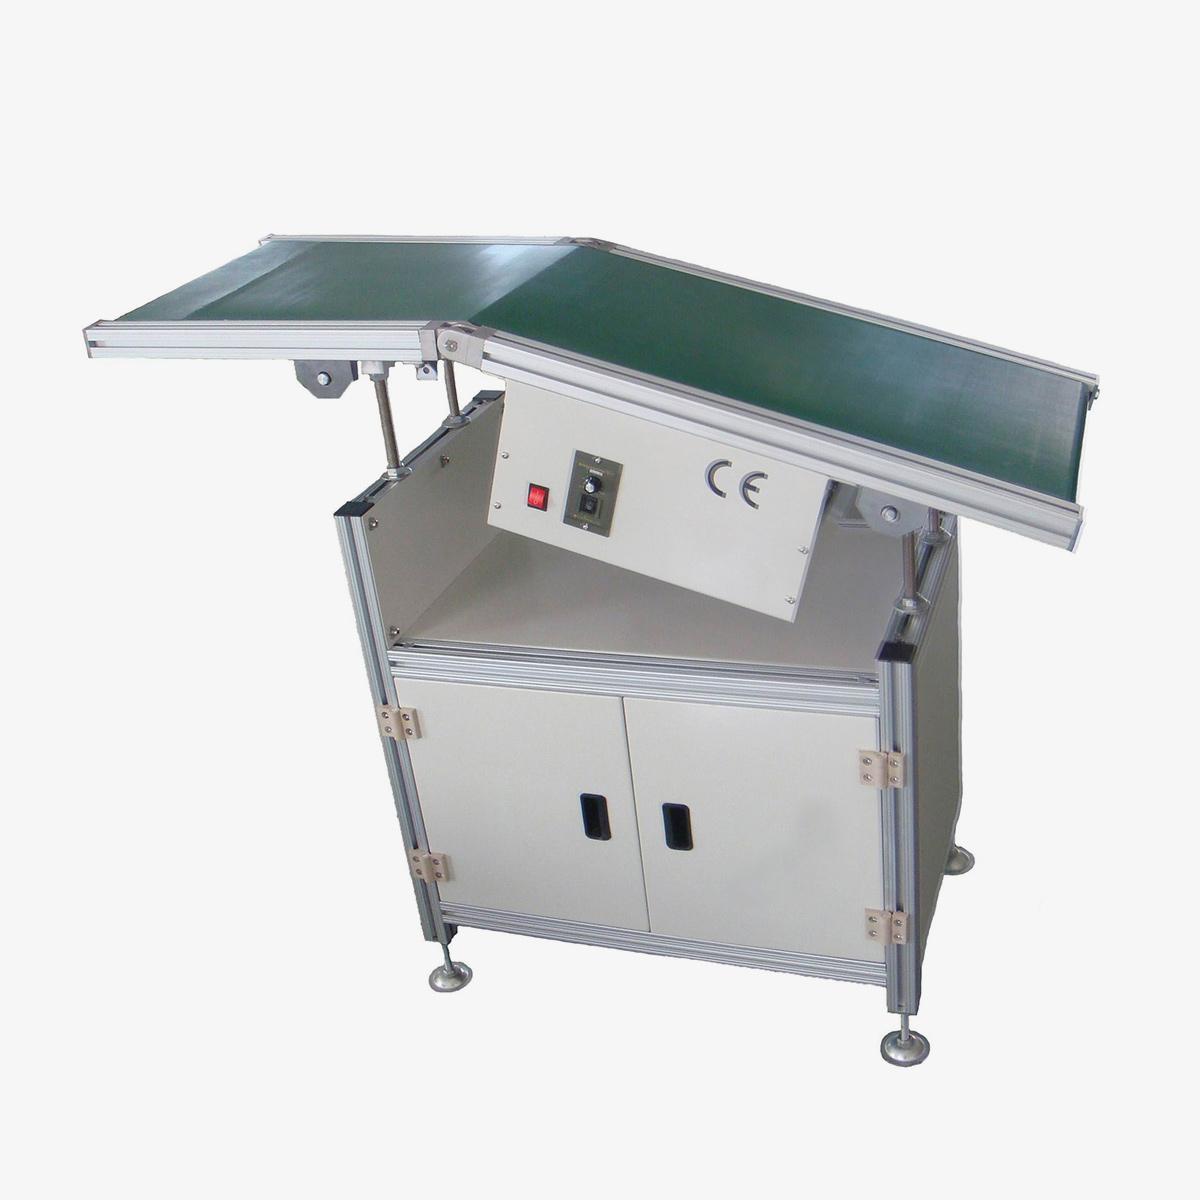 Wave Solder Outfeed Conveyor - Adtool Corporation - Distributor of